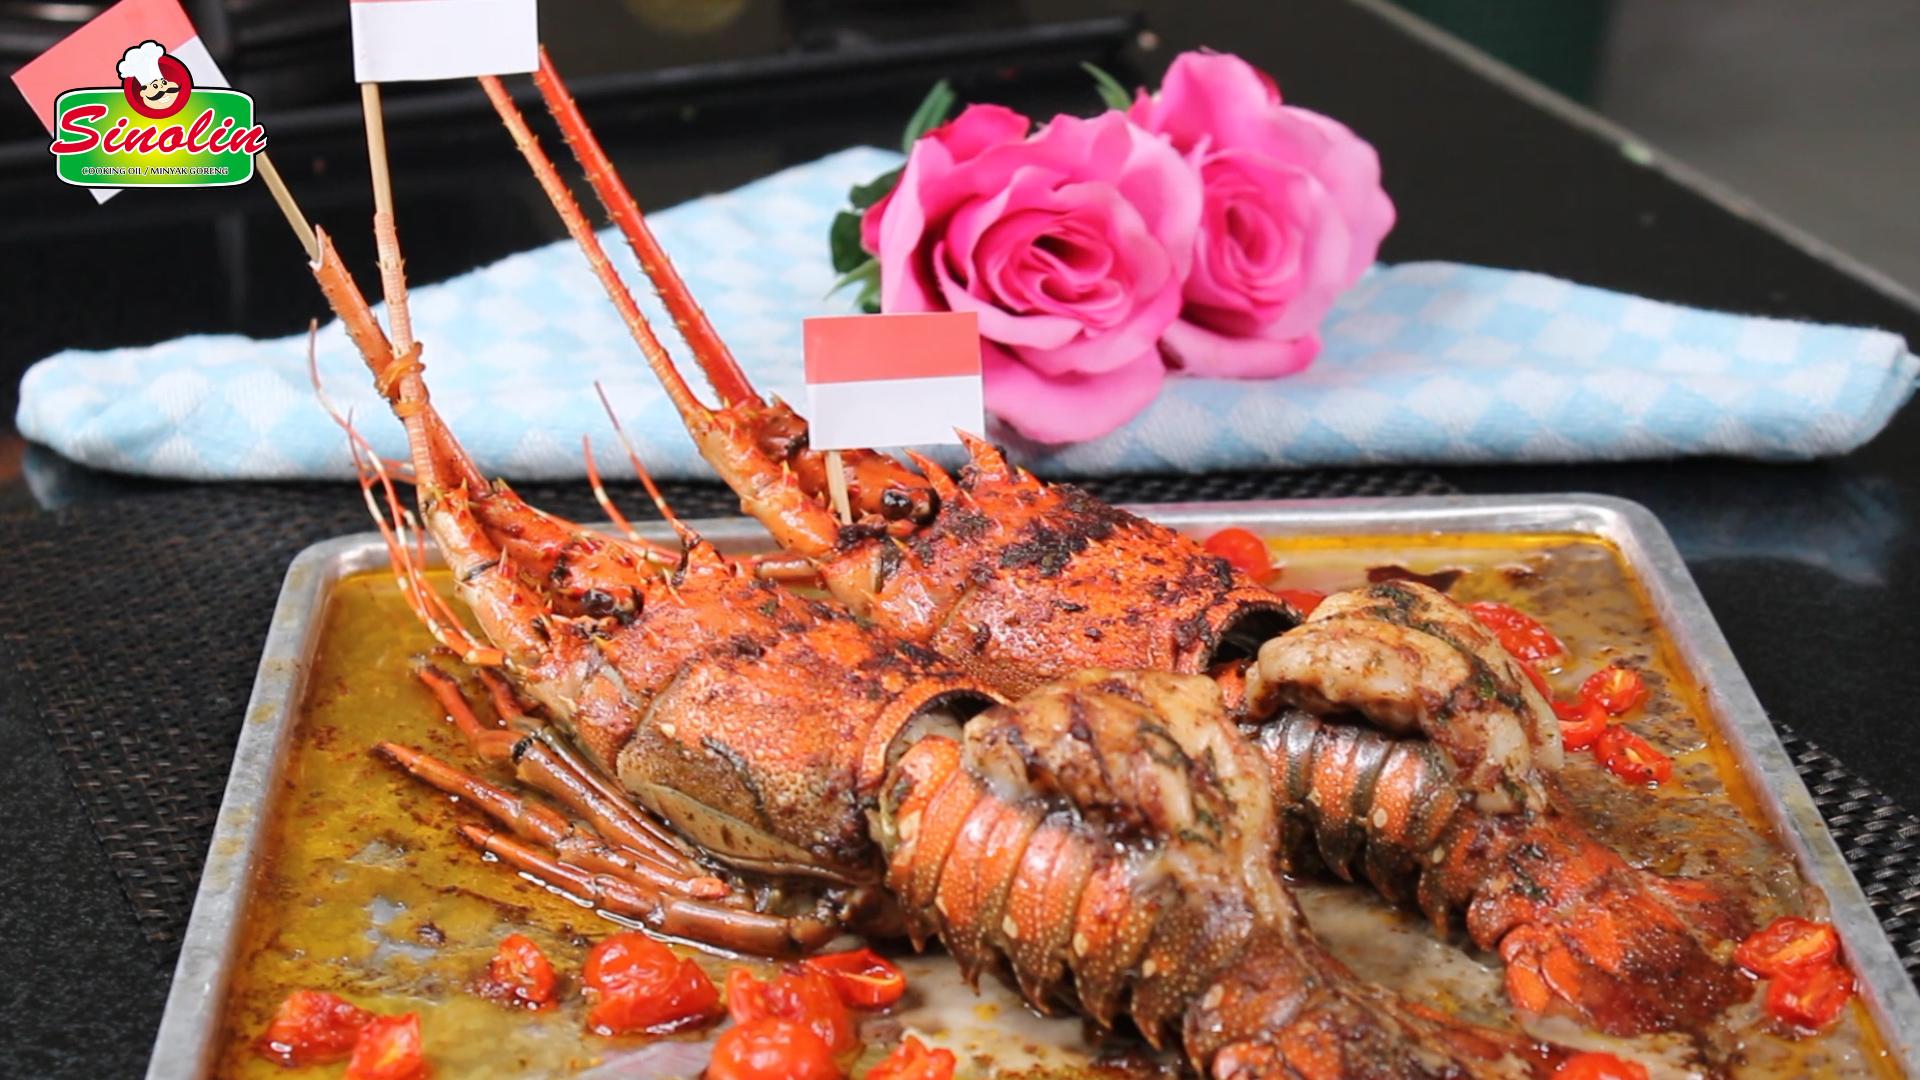 Ekor Lobster Dengan Bawang Putih Mentega Oleh Dapur Sinolin